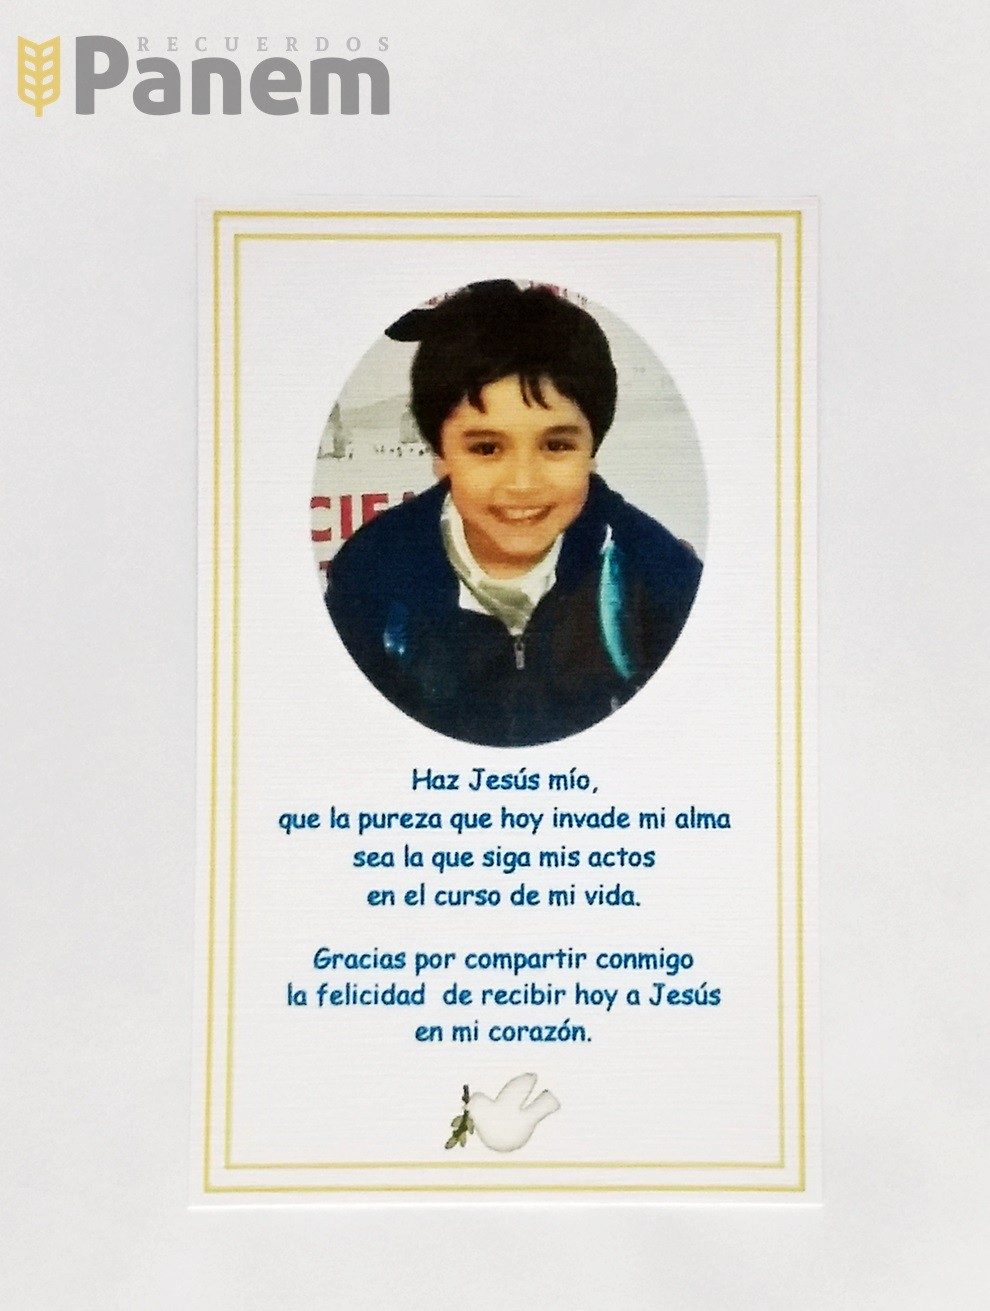 726a788405d Santitos con foto niño (Valor por docena) - Recuerdos Panem